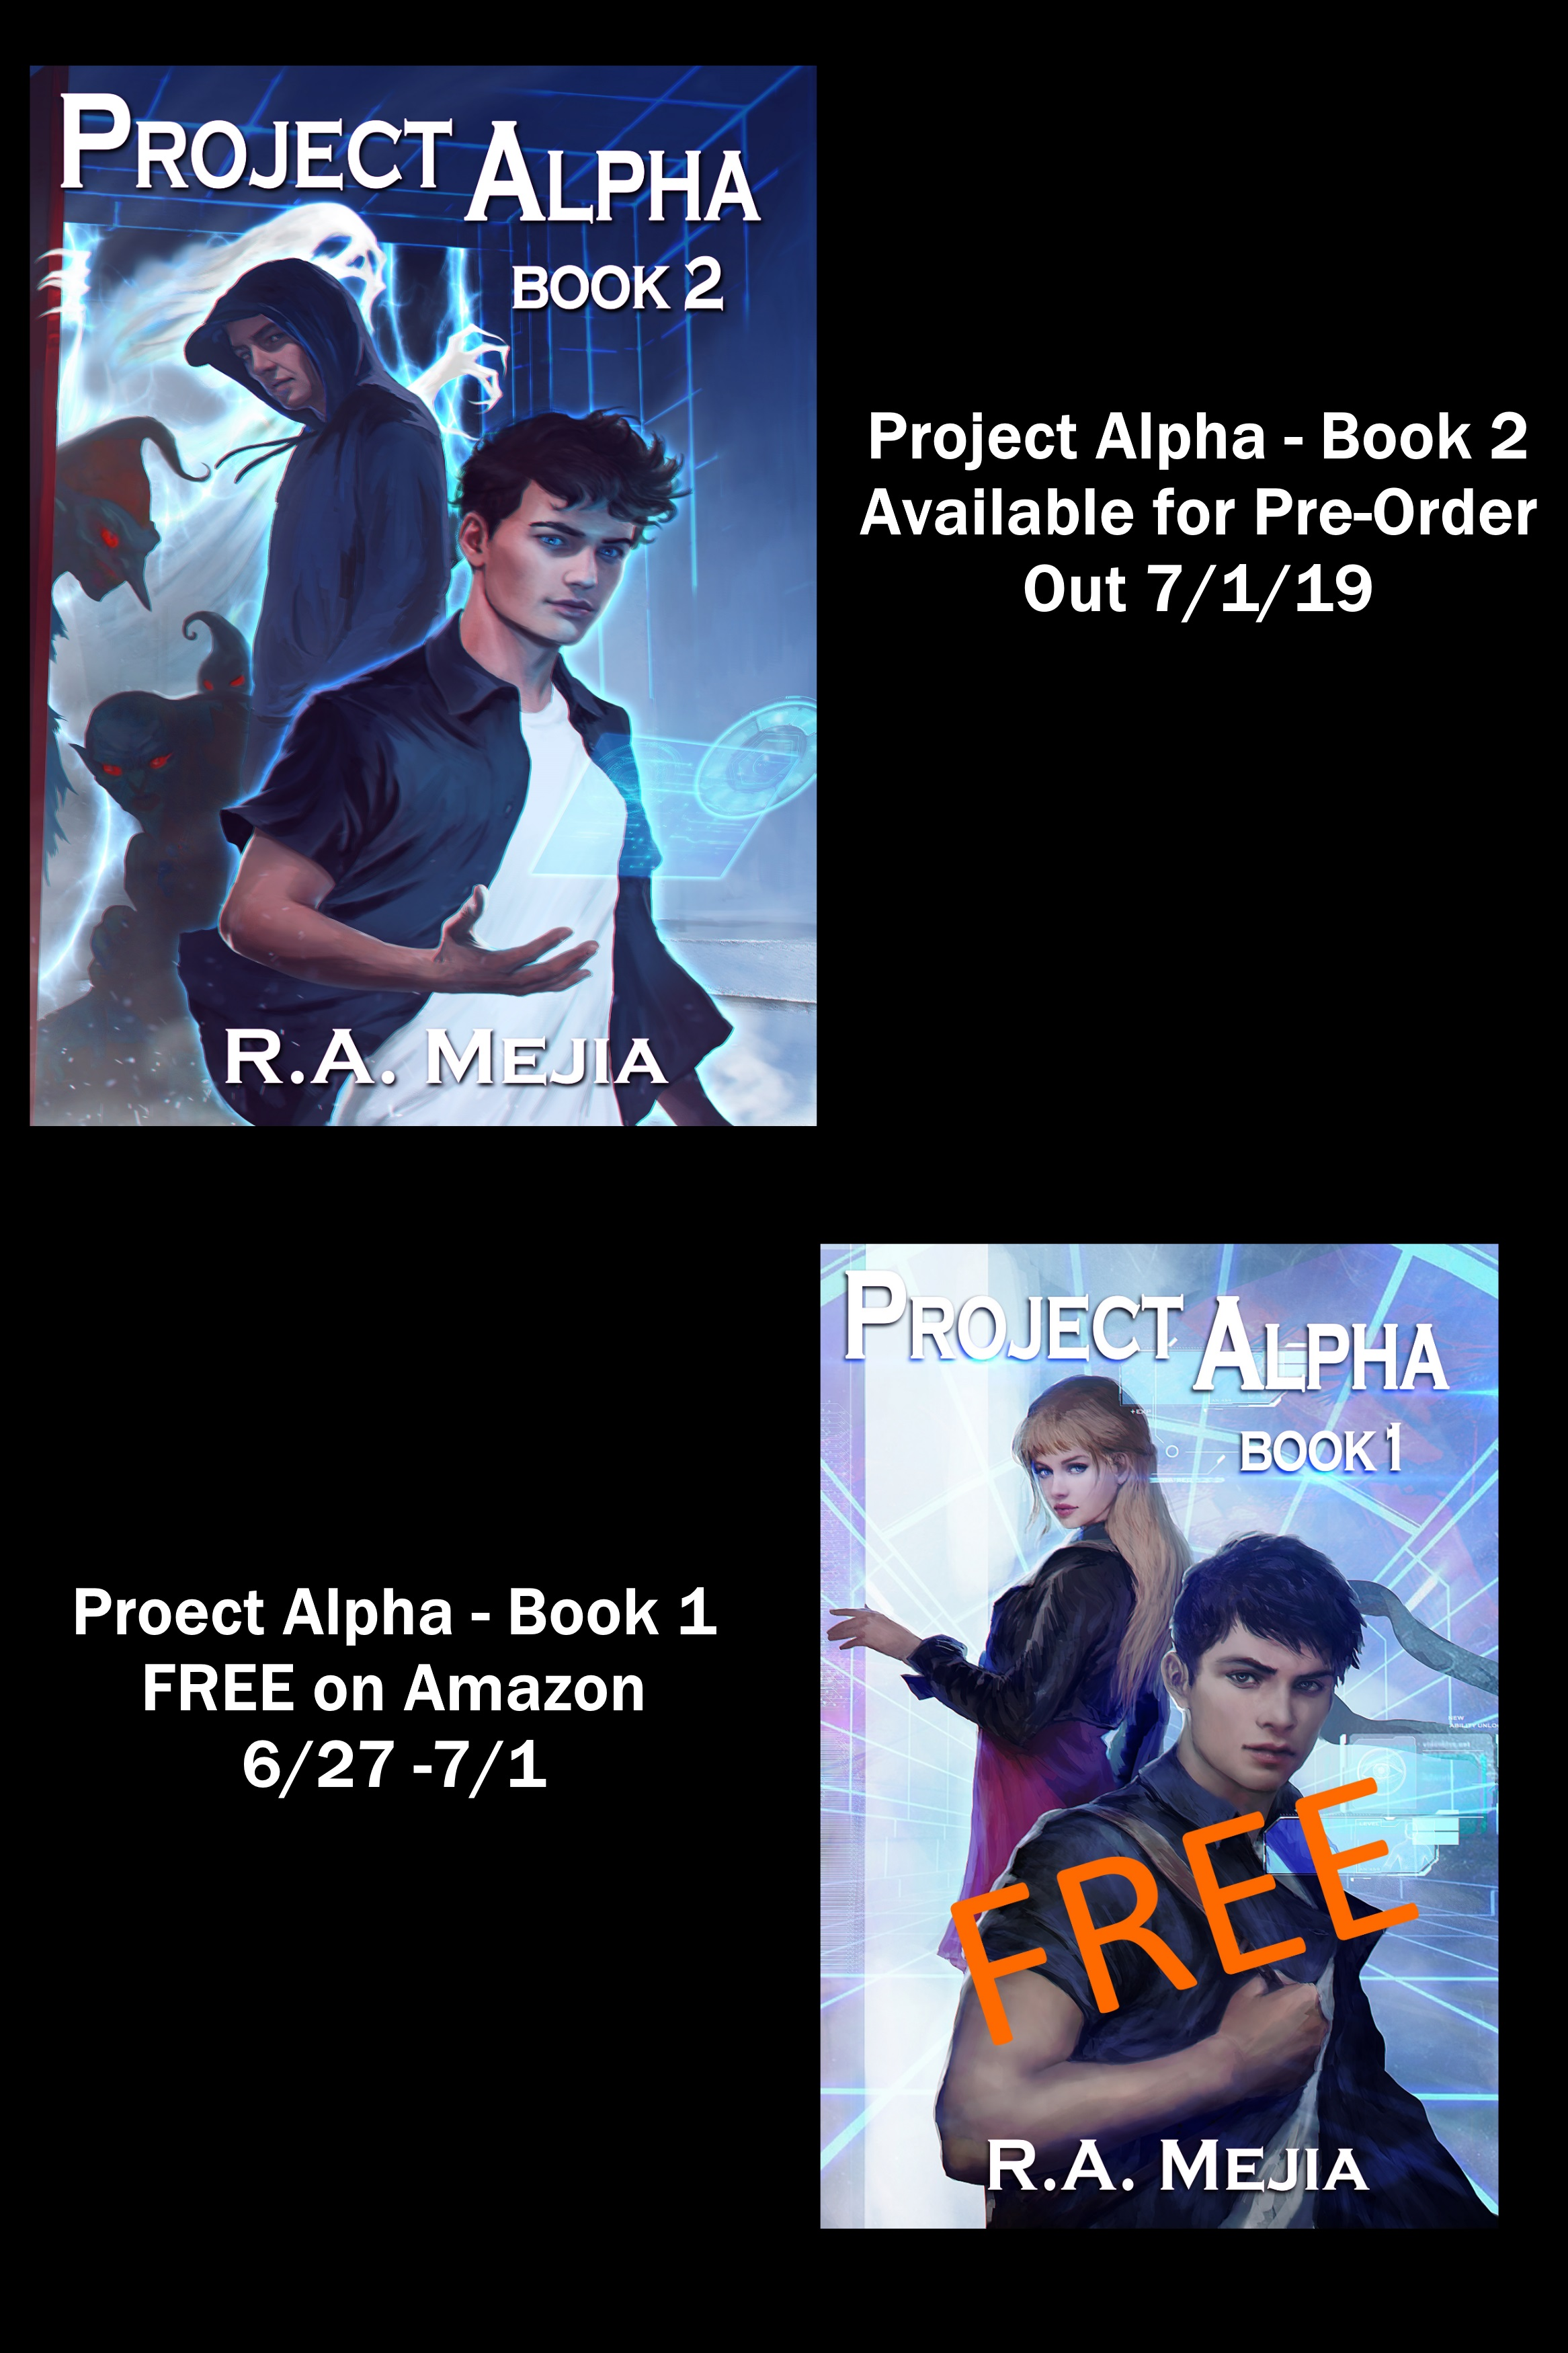 ProjectAlphaFreeV2.jpg